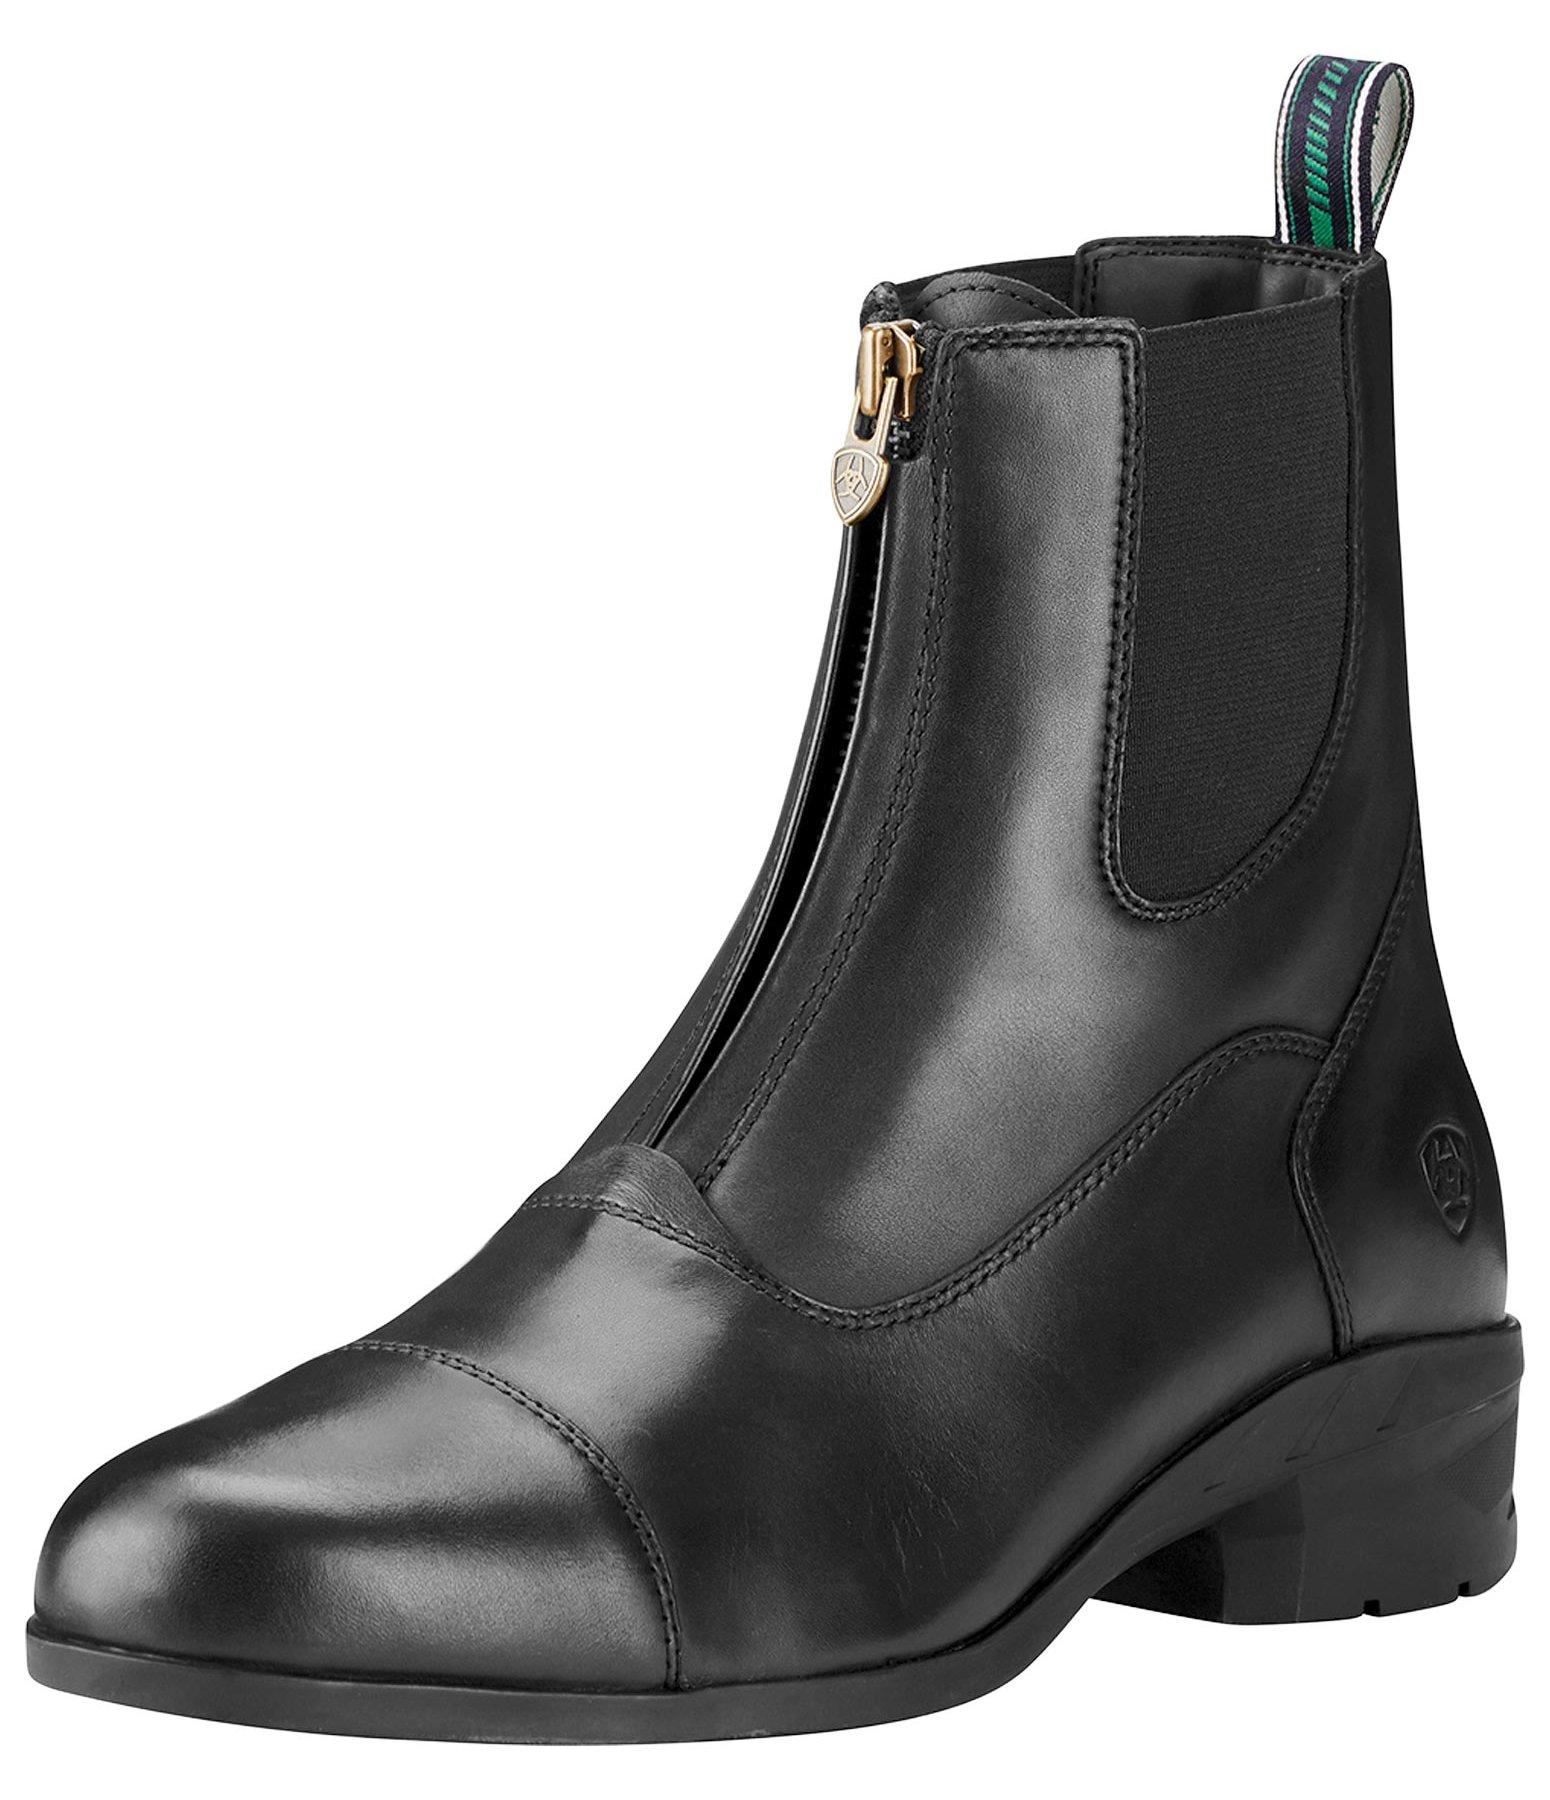 Women's ZIP Paddock Boots Heritage IV - Jodhpur Boots - Kramer ...